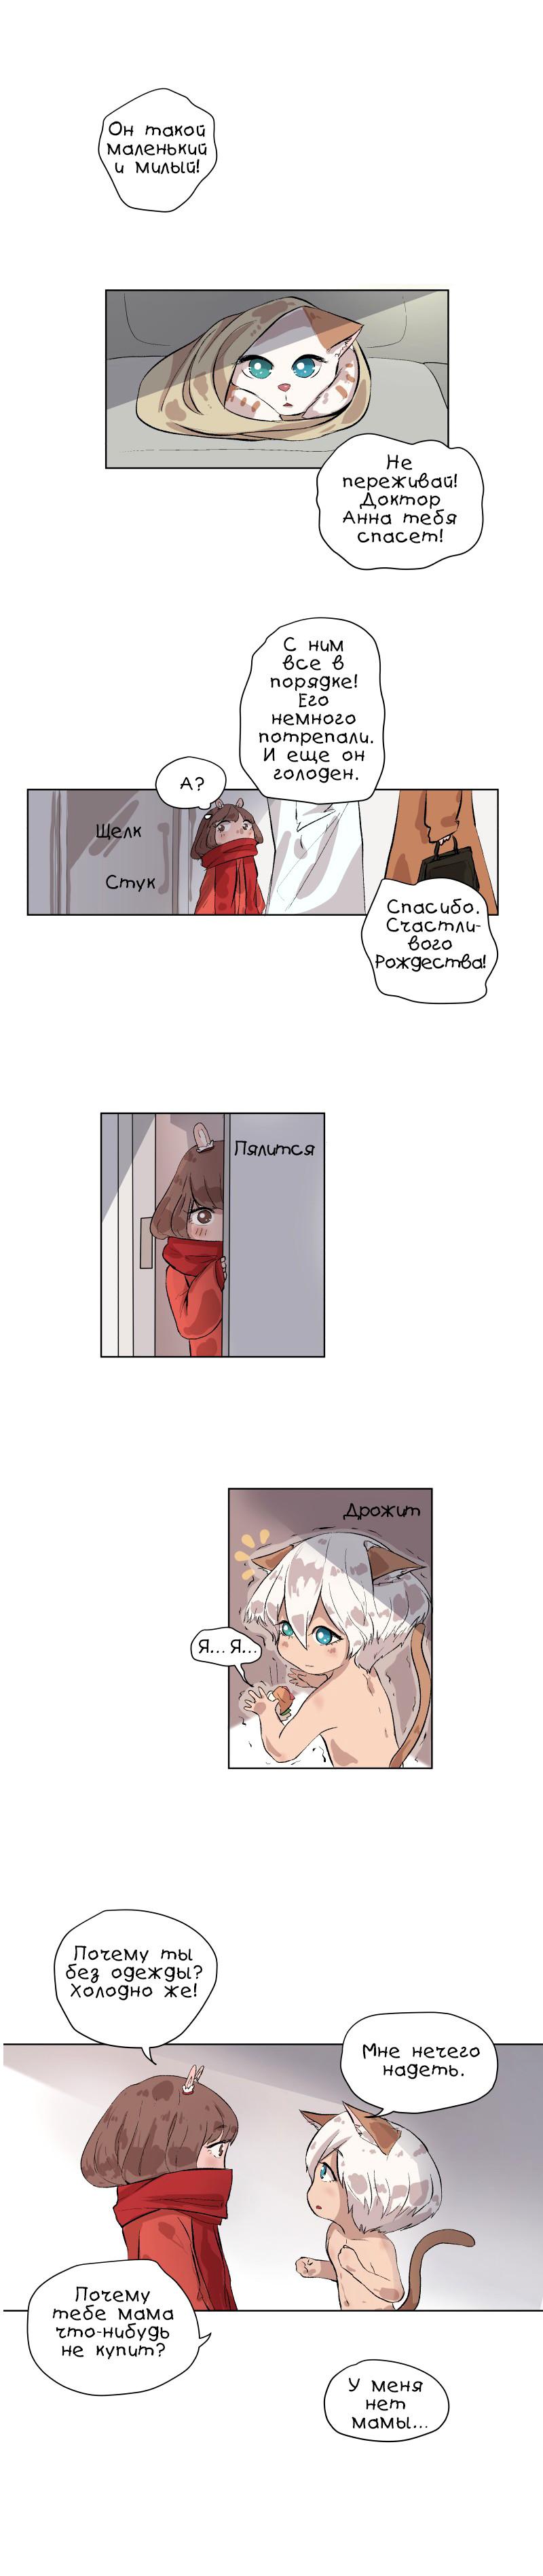 https://r1.ninemanga.com/comics/pic2/58/31802/315219/1483095908841.jpg Page 3